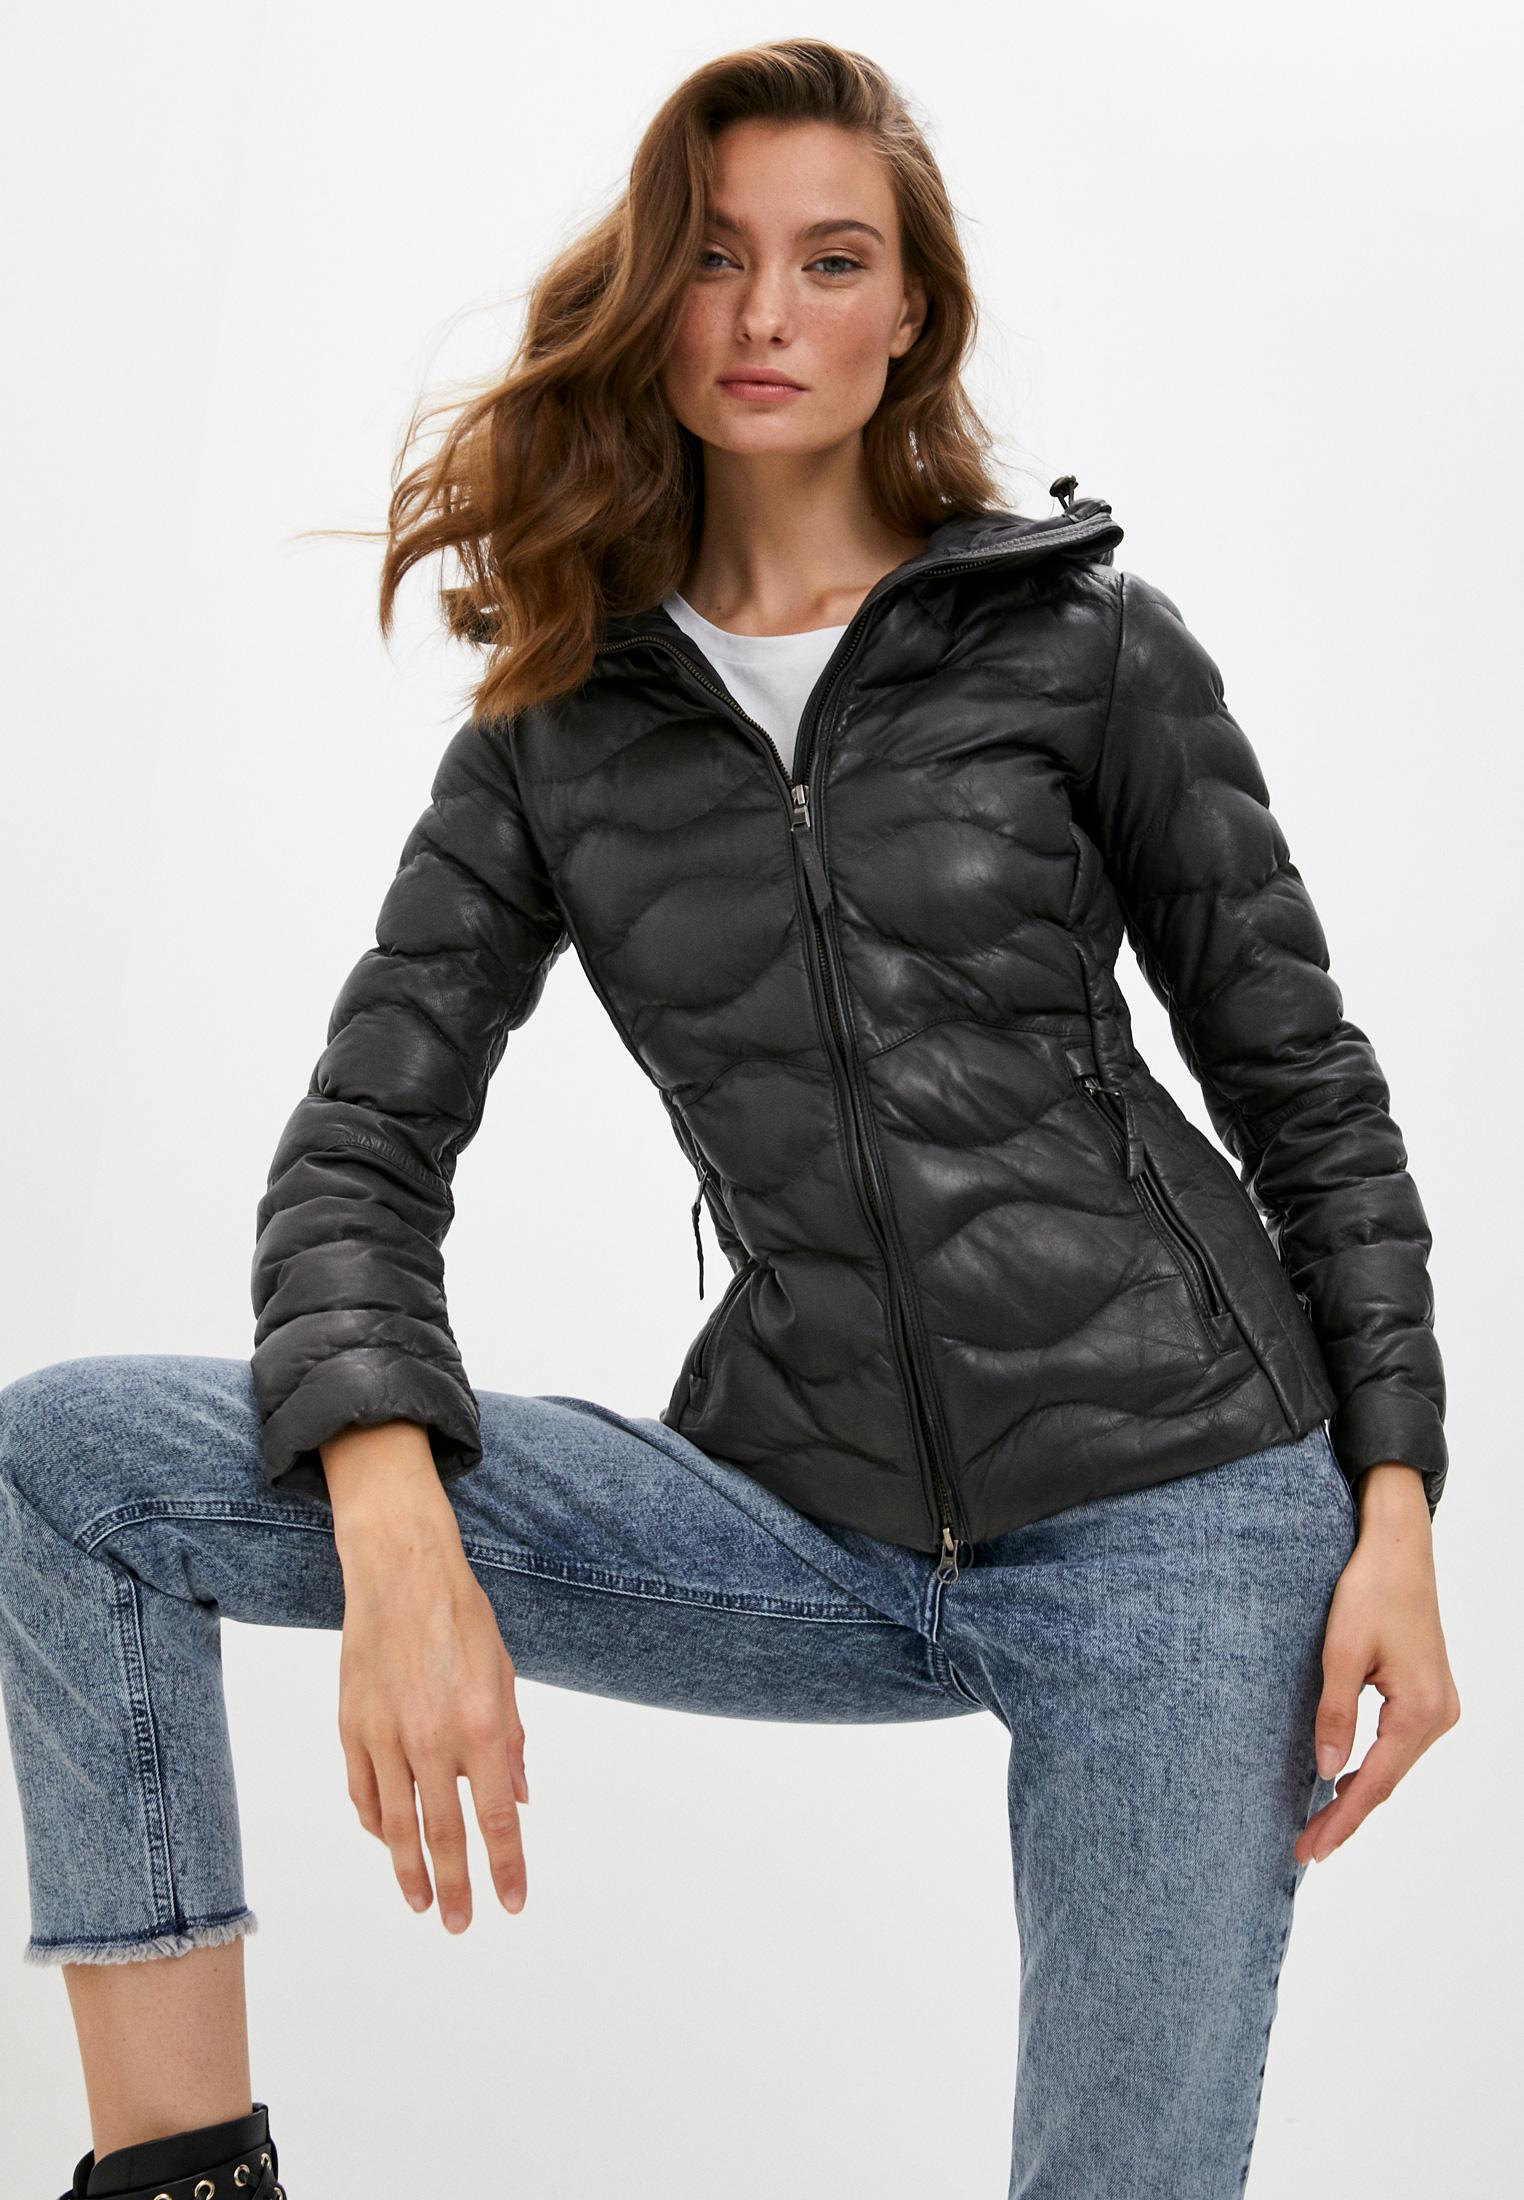 Кожаная куртка Blouson 503nappa paris